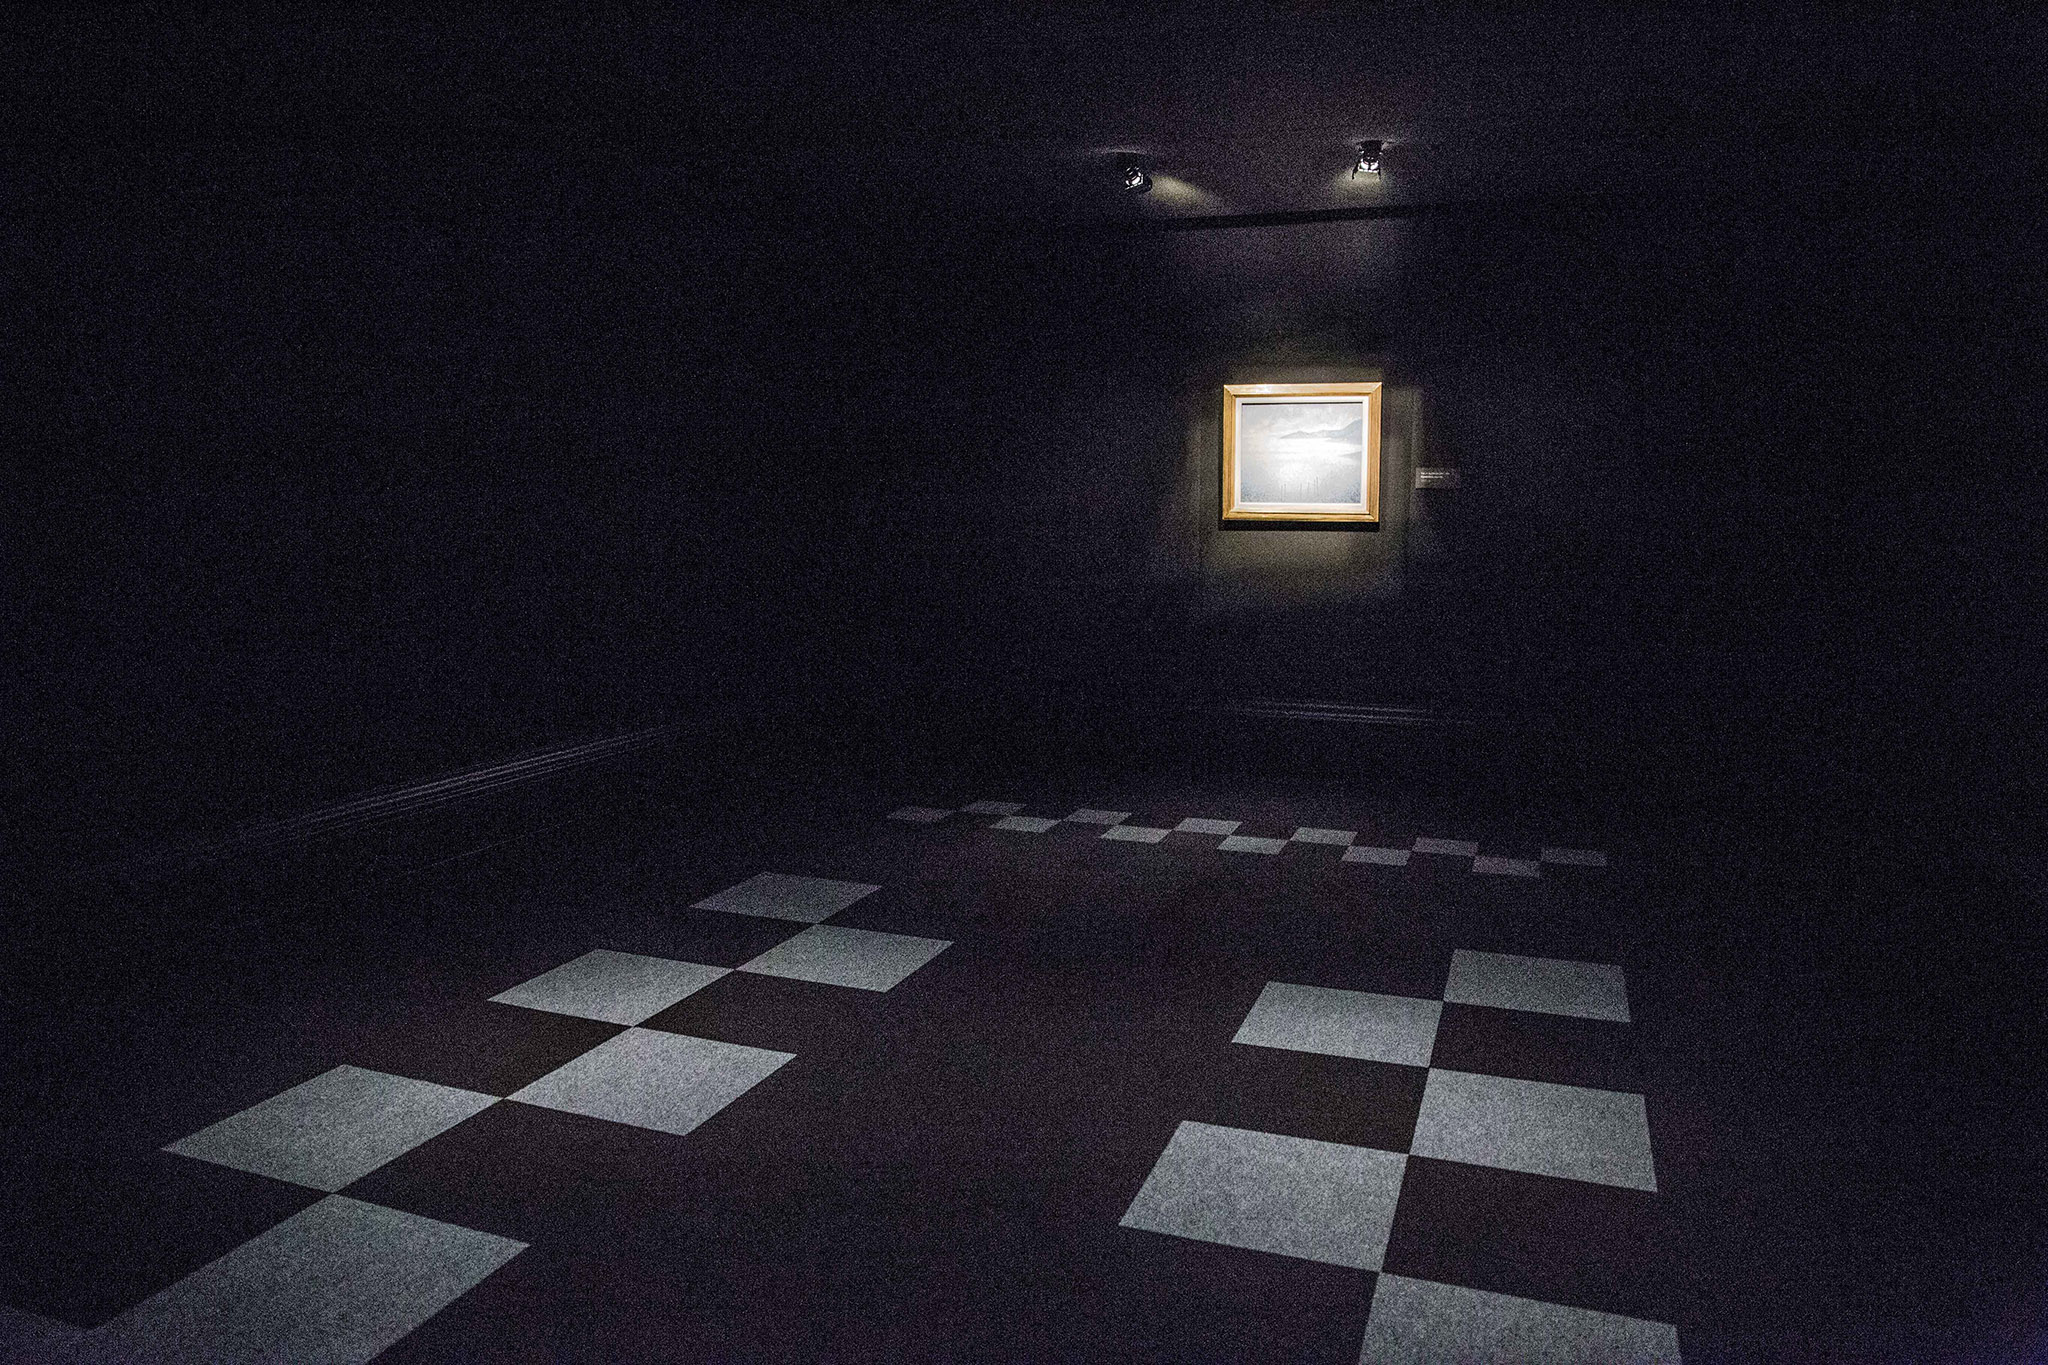 Jamie xx creates new 'Ultramarine' installation for Soundscapes exhibition